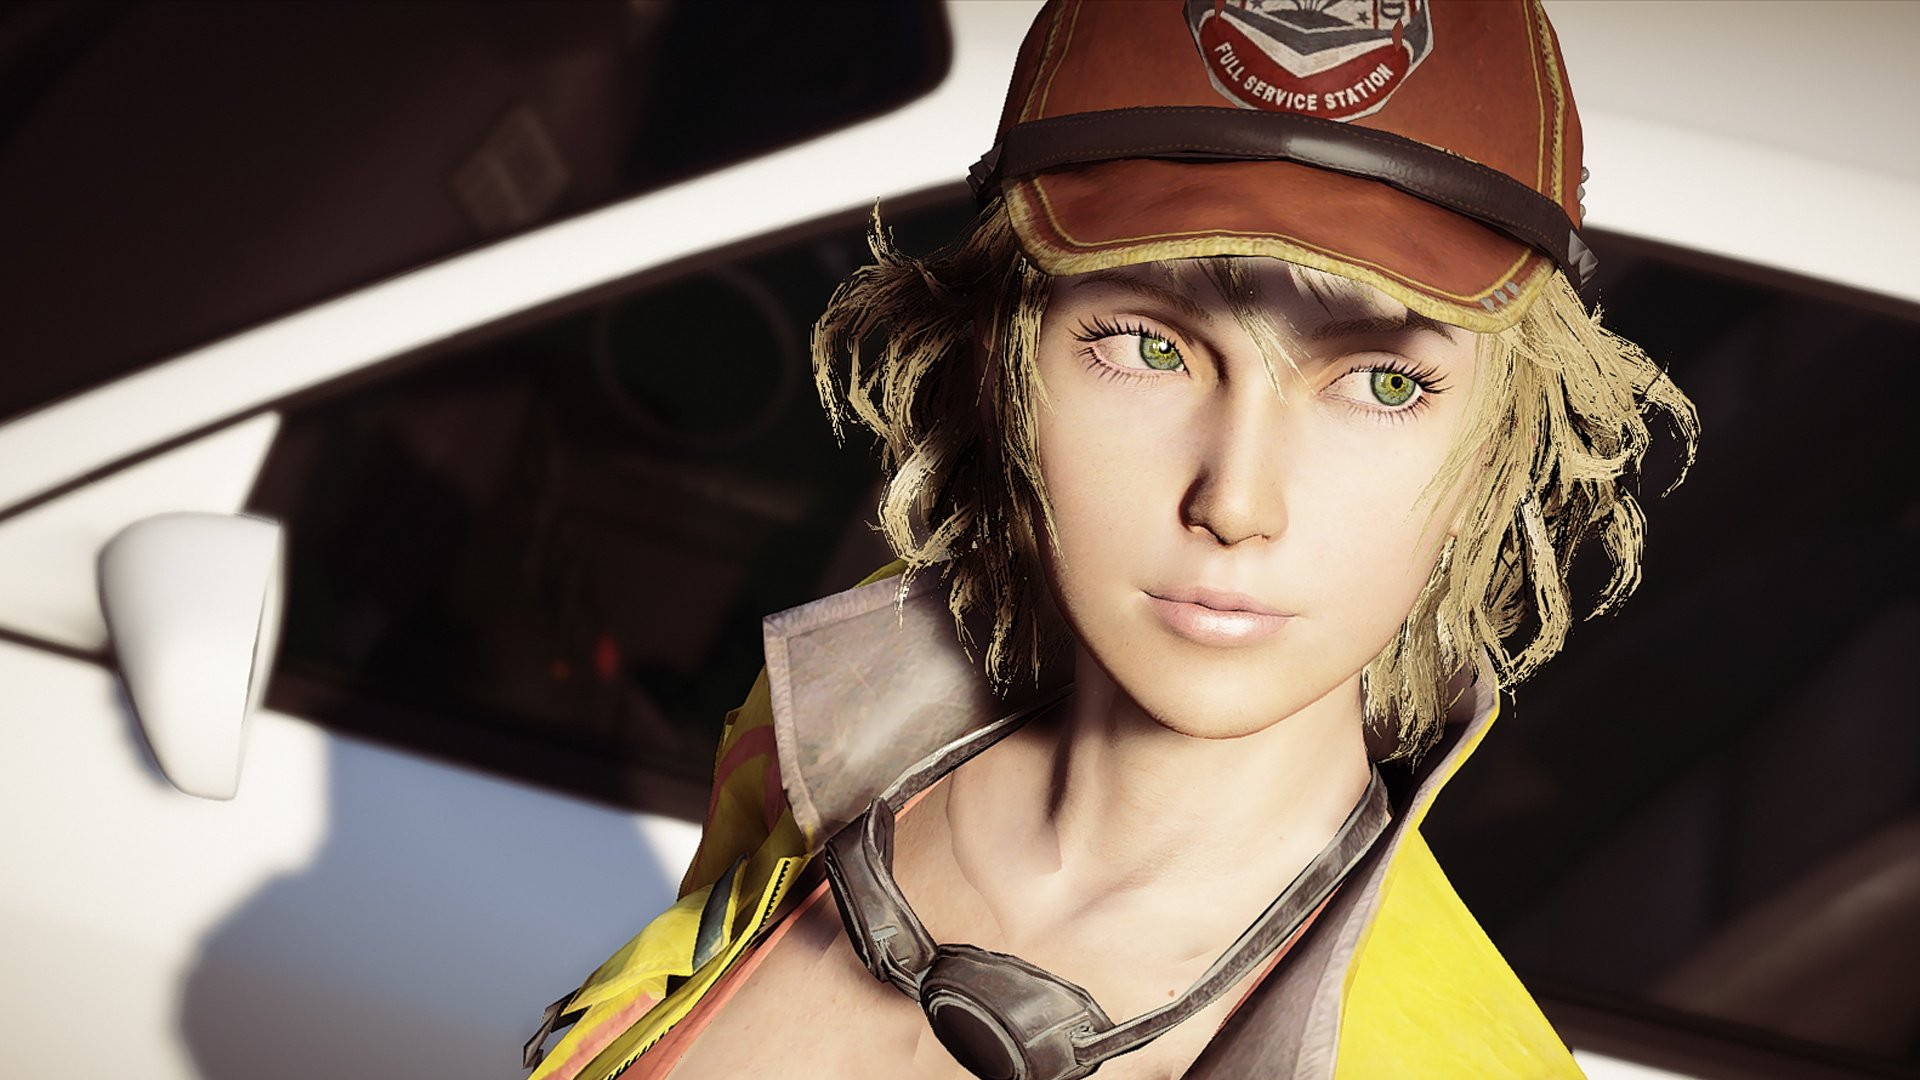 Noctis Lucis Caelum & Cindy Aurum Final Fantasy XV [Add-on Ped